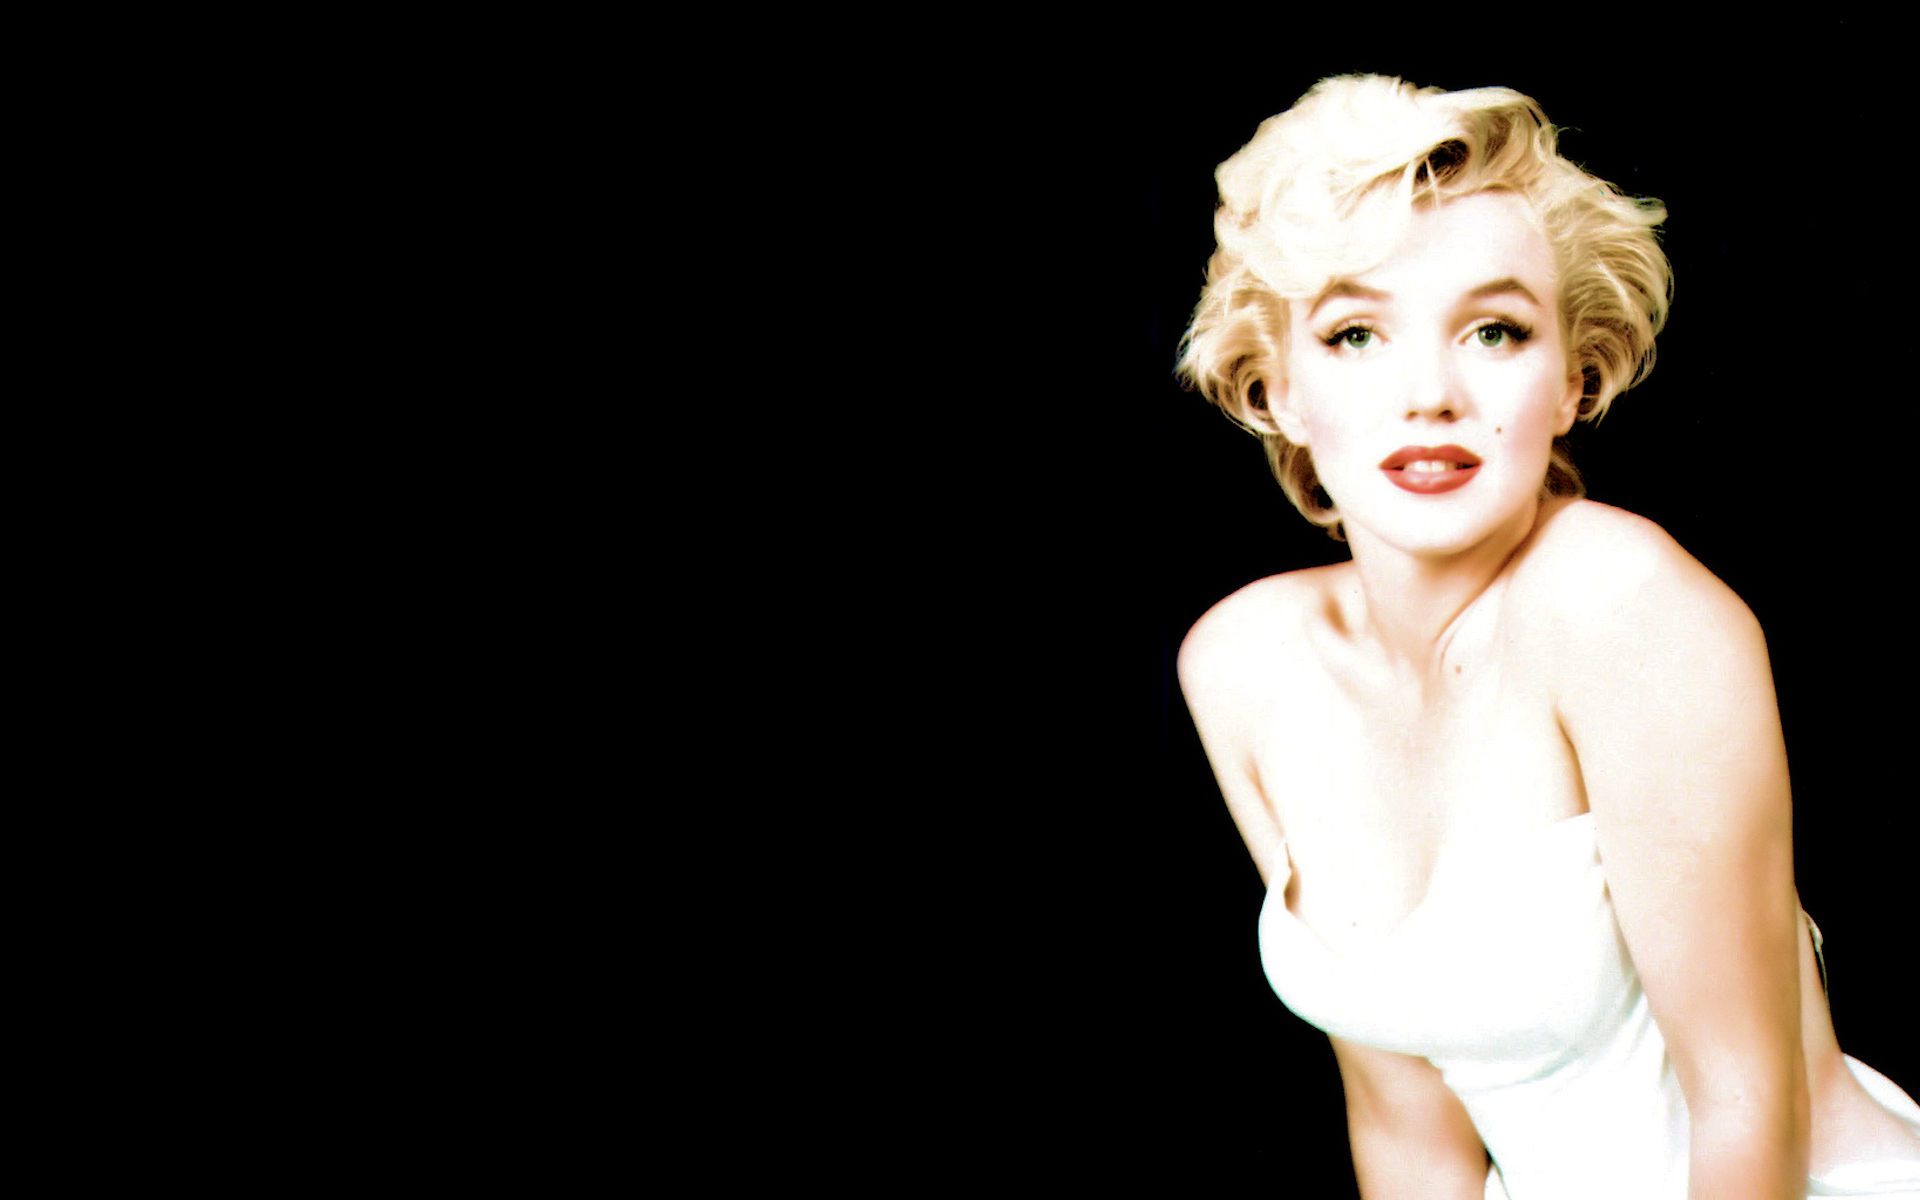 Marilyn Monroe Widescreen | Wallpup.com